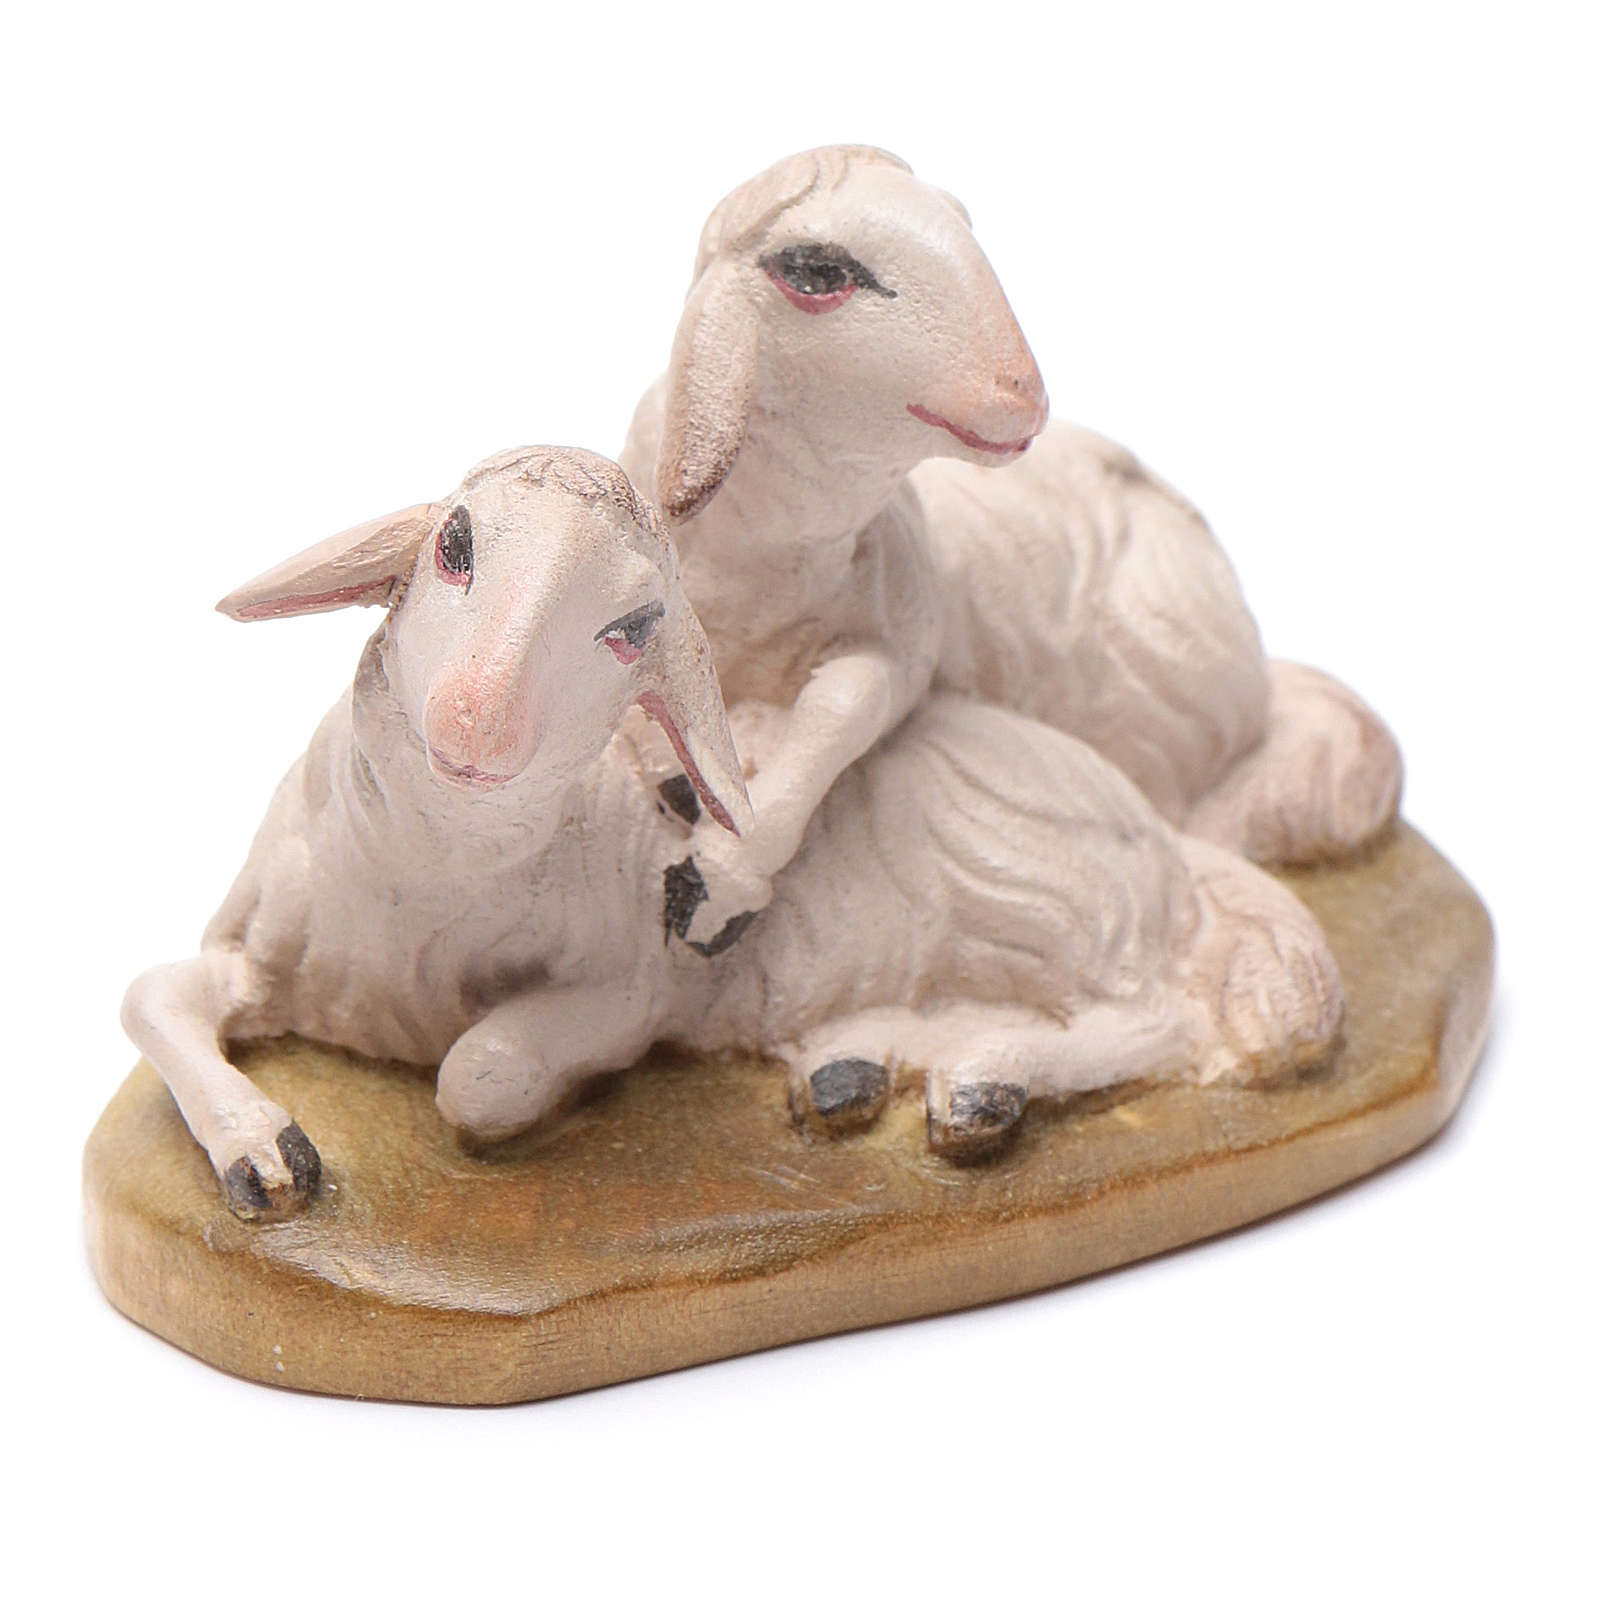 Pecore 12 cm legno presepe mod. Valgardena 4